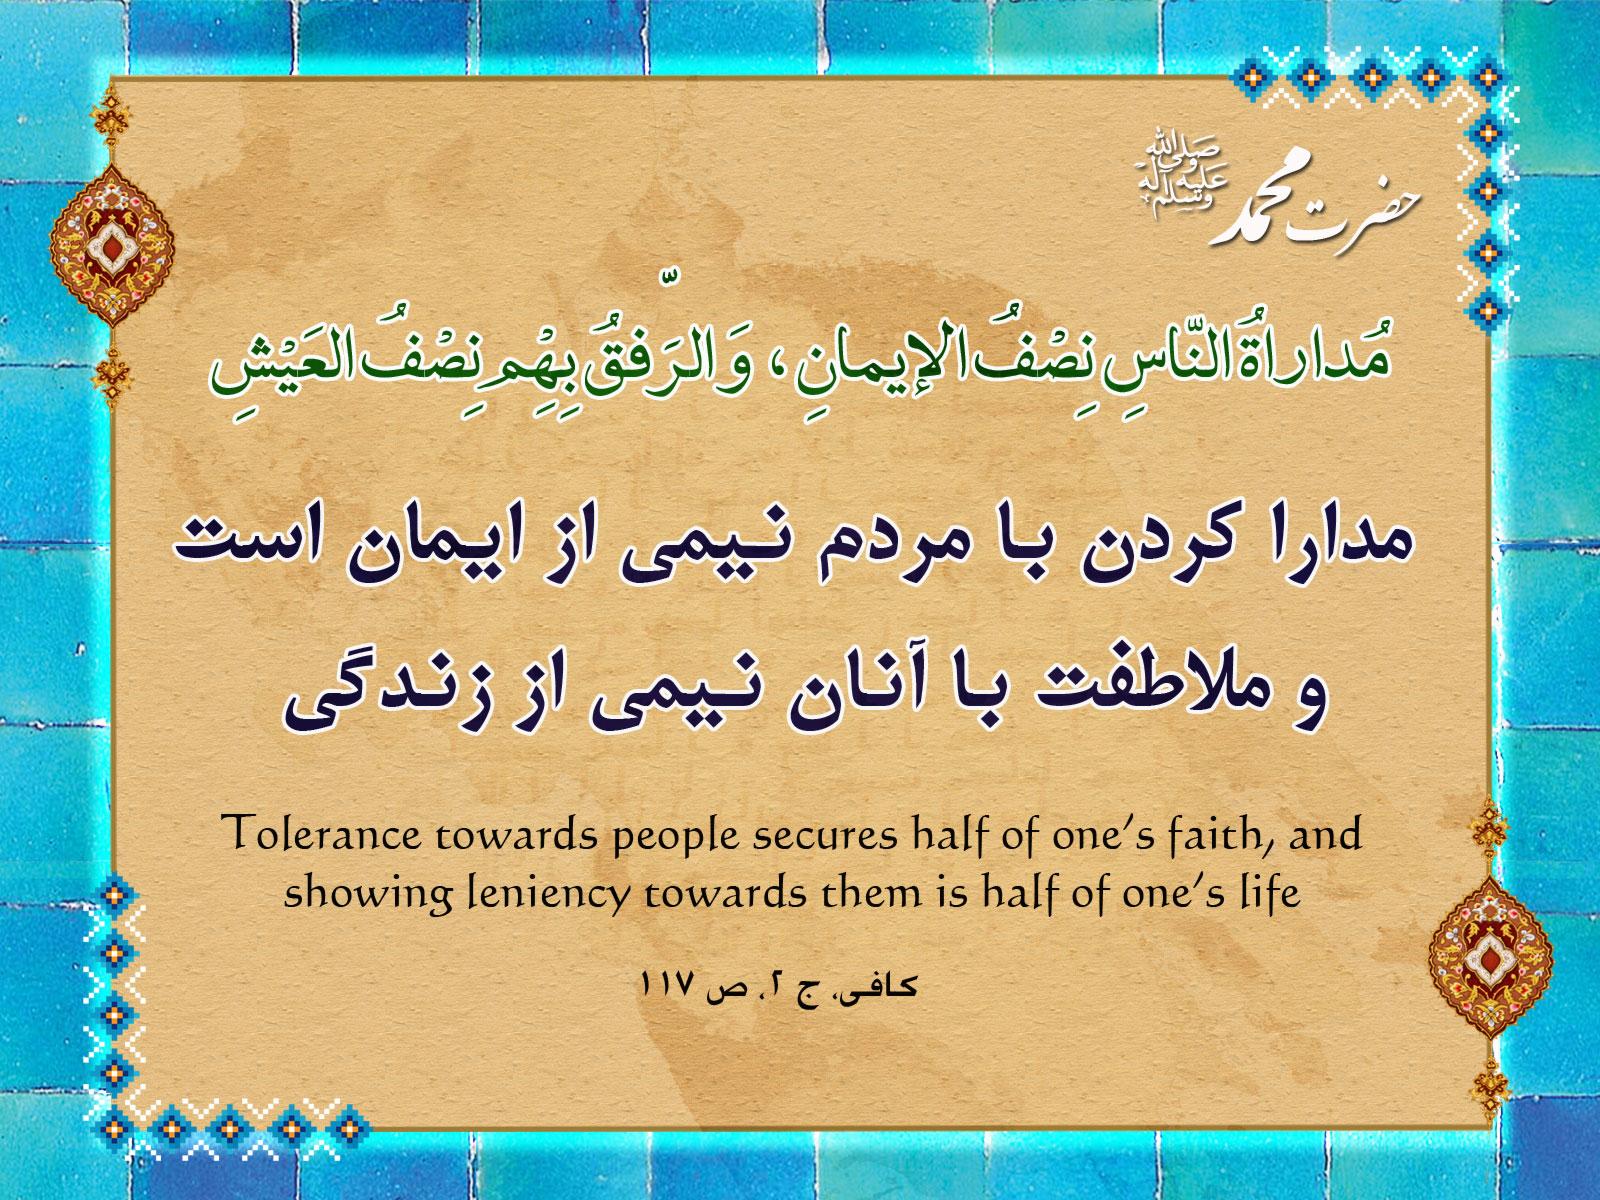 http://bashiran.ir/wp-content/uploads/2015/01/mohammad1.jpg